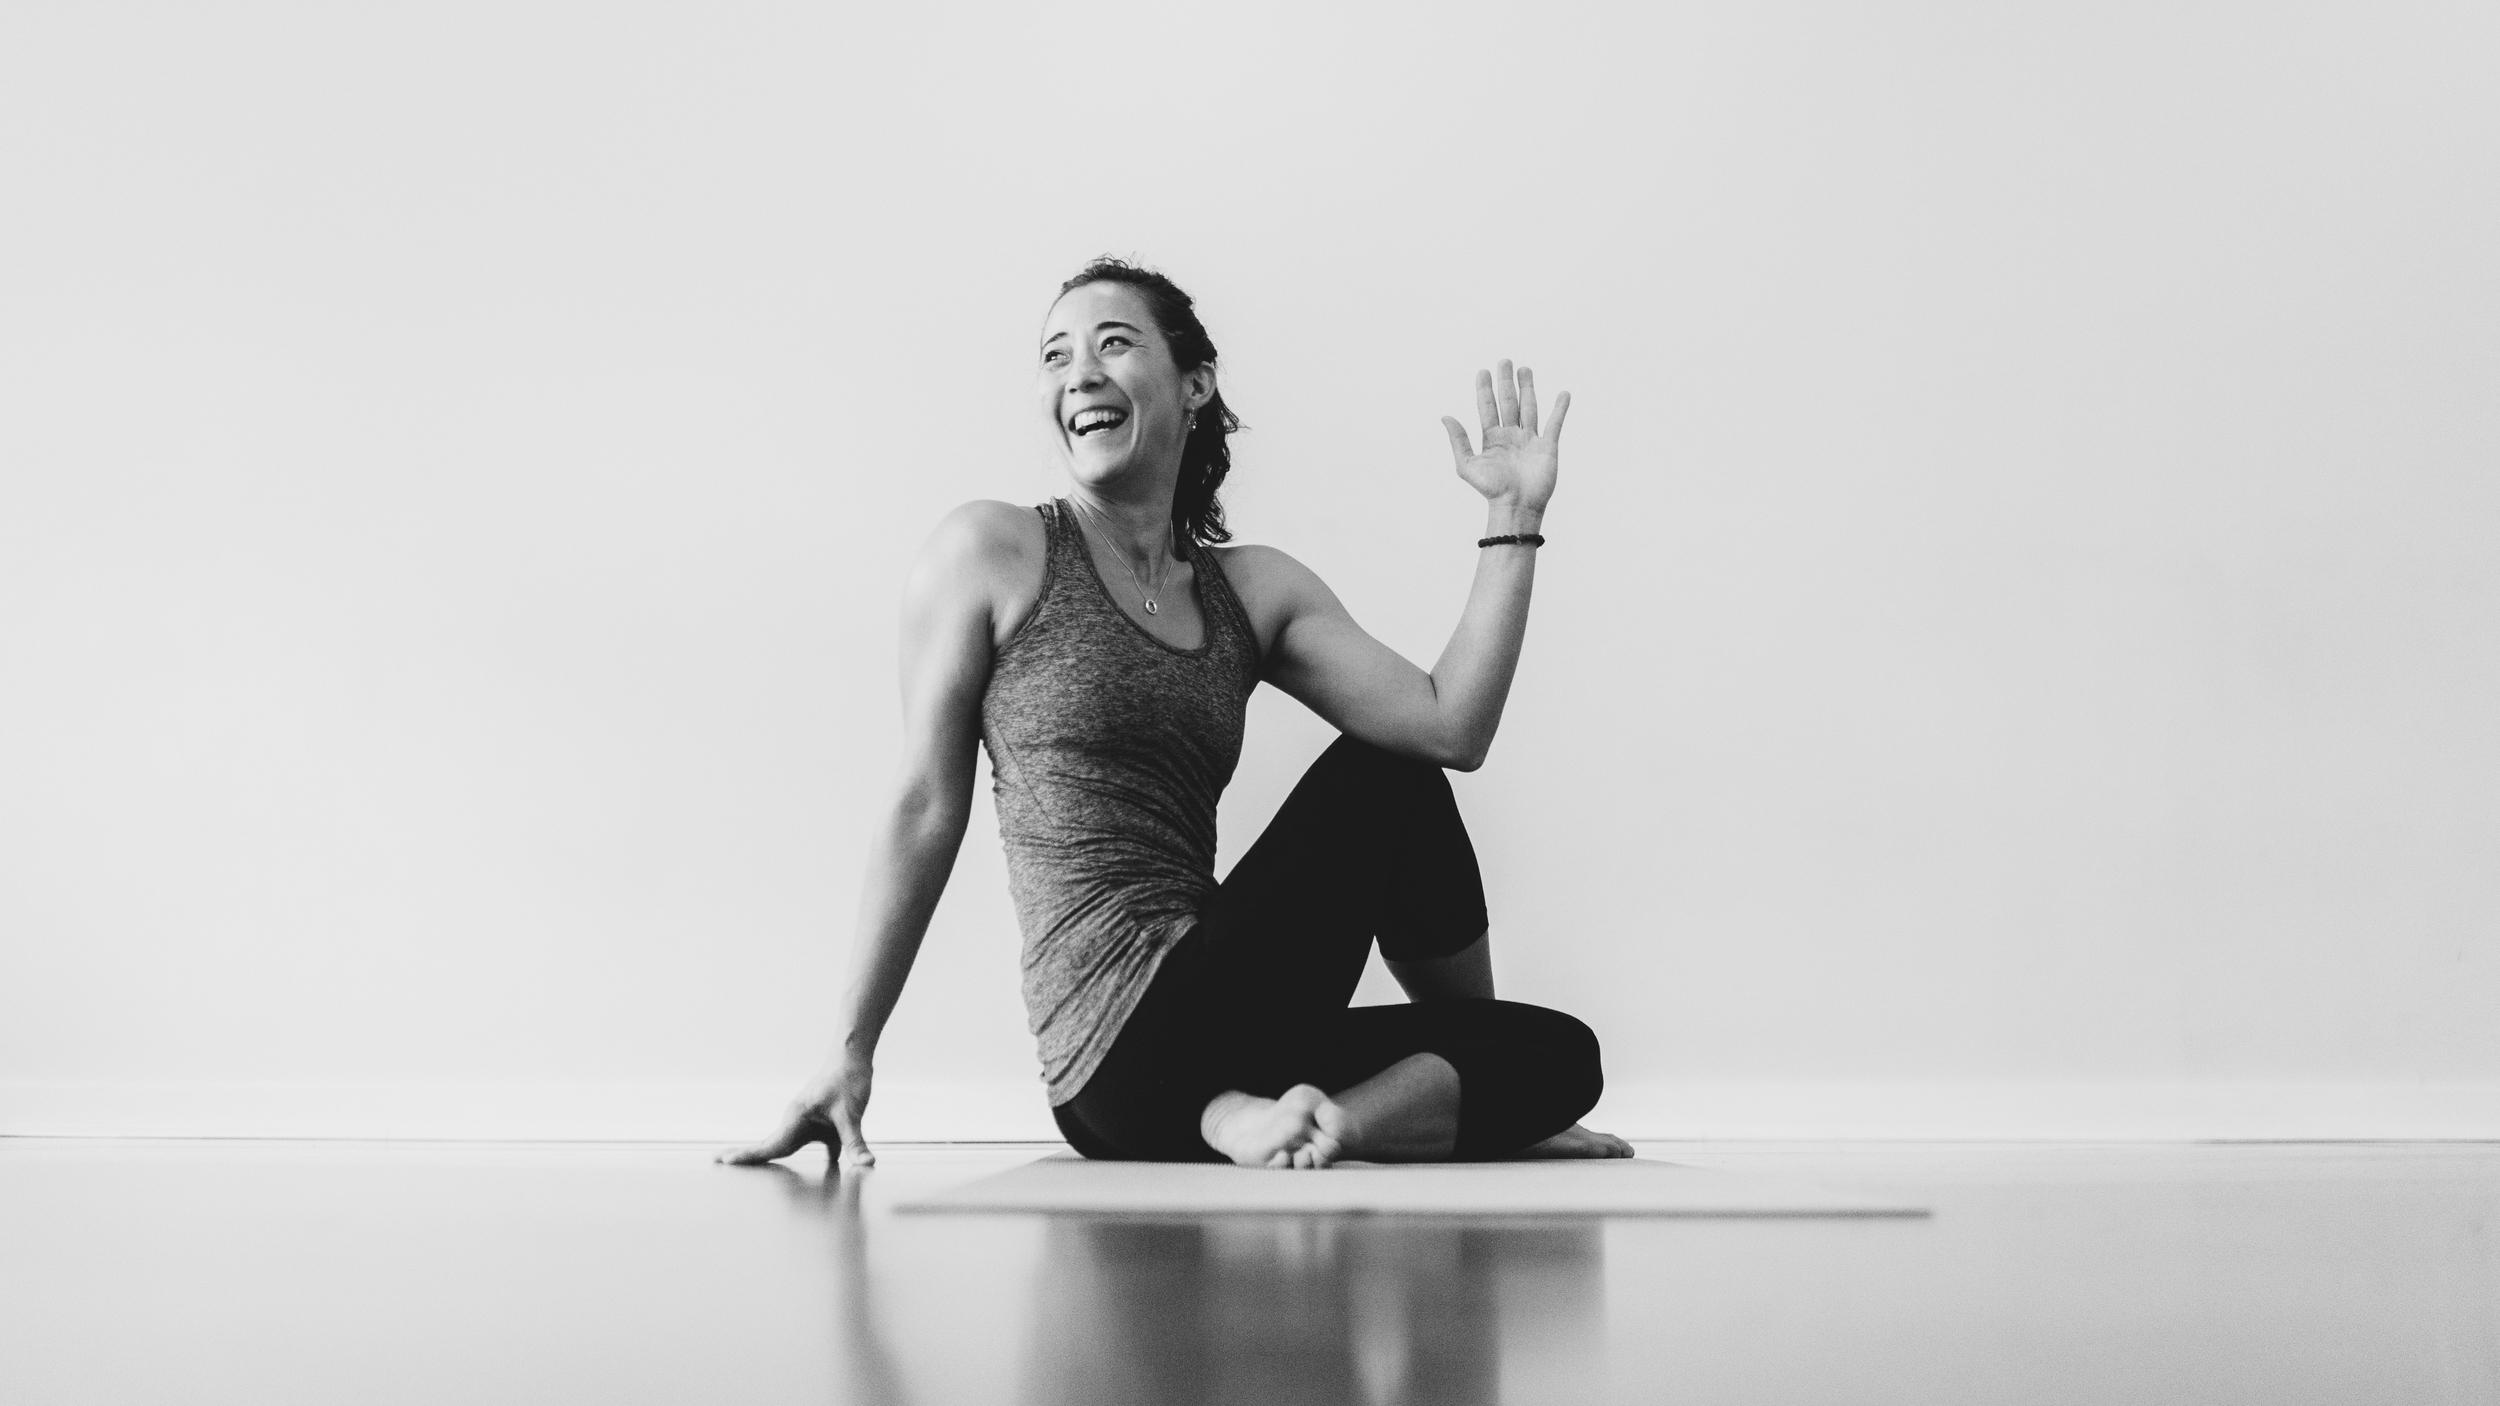 stocksy - kim jay photo - b&w yoga-9.jpg